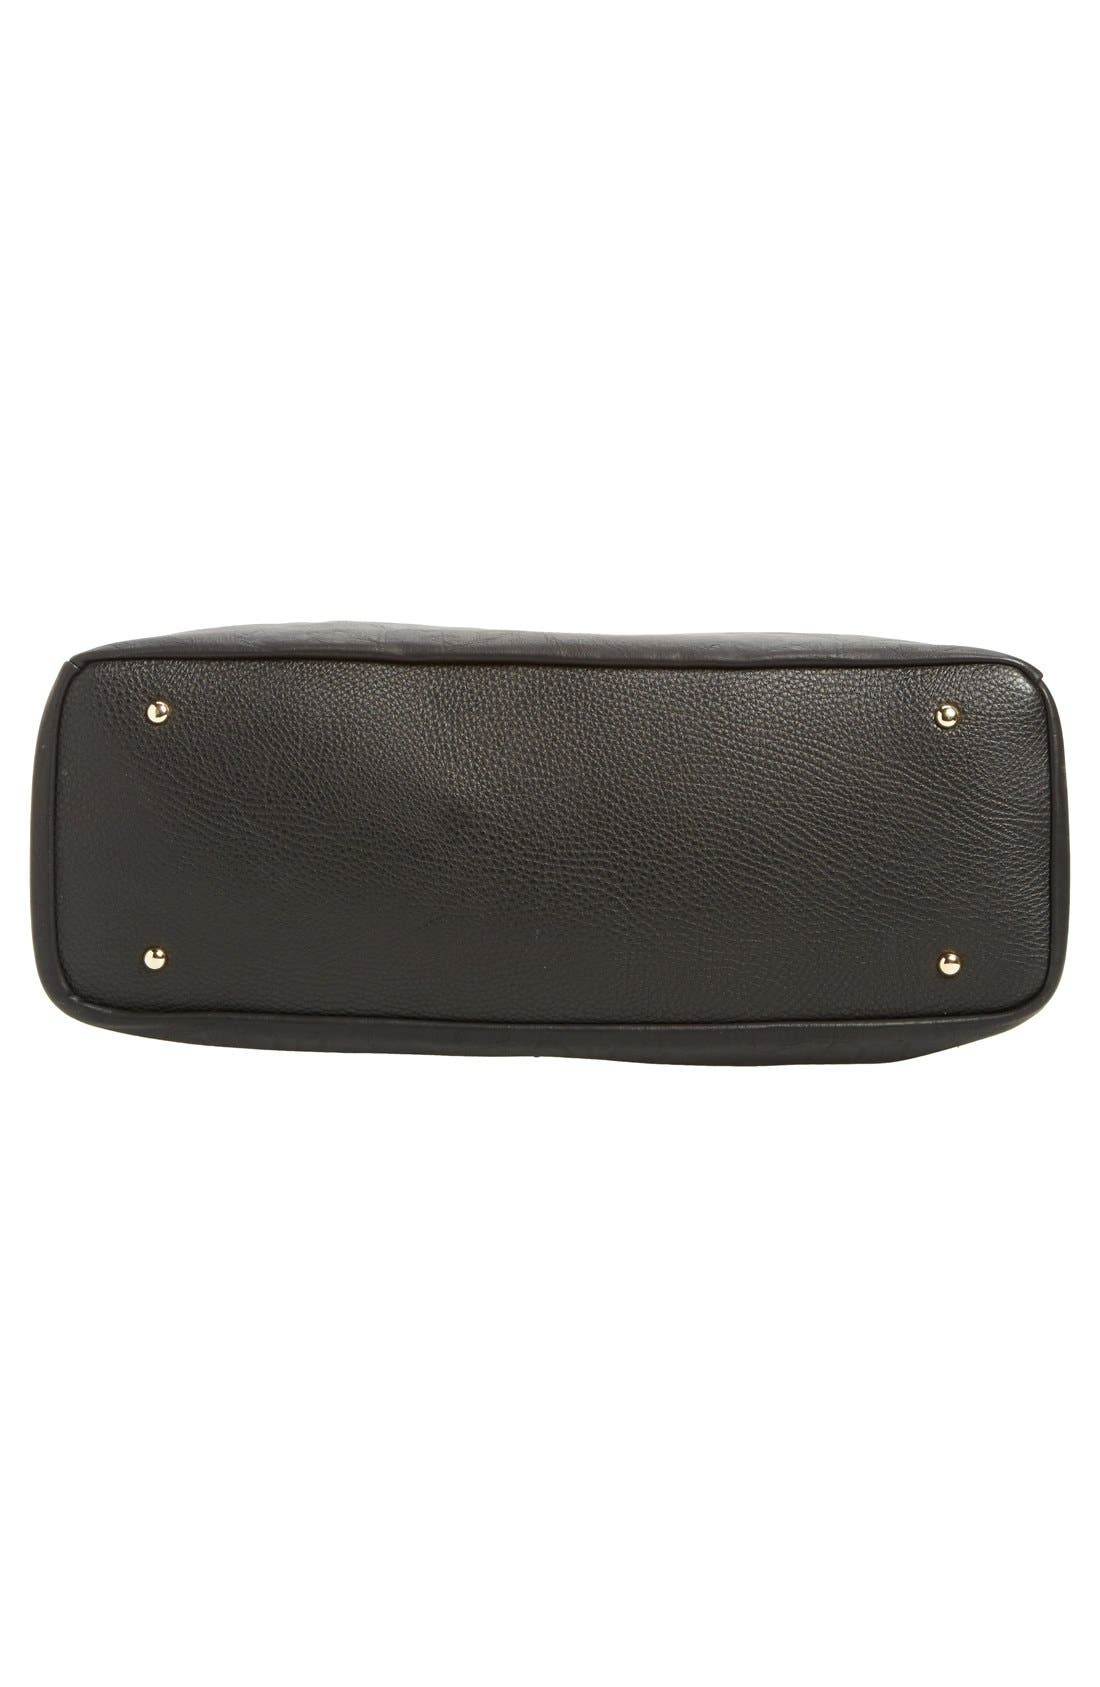 Mason Weekend Bag,                             Alternate thumbnail 6, color,                             Pebbled Black